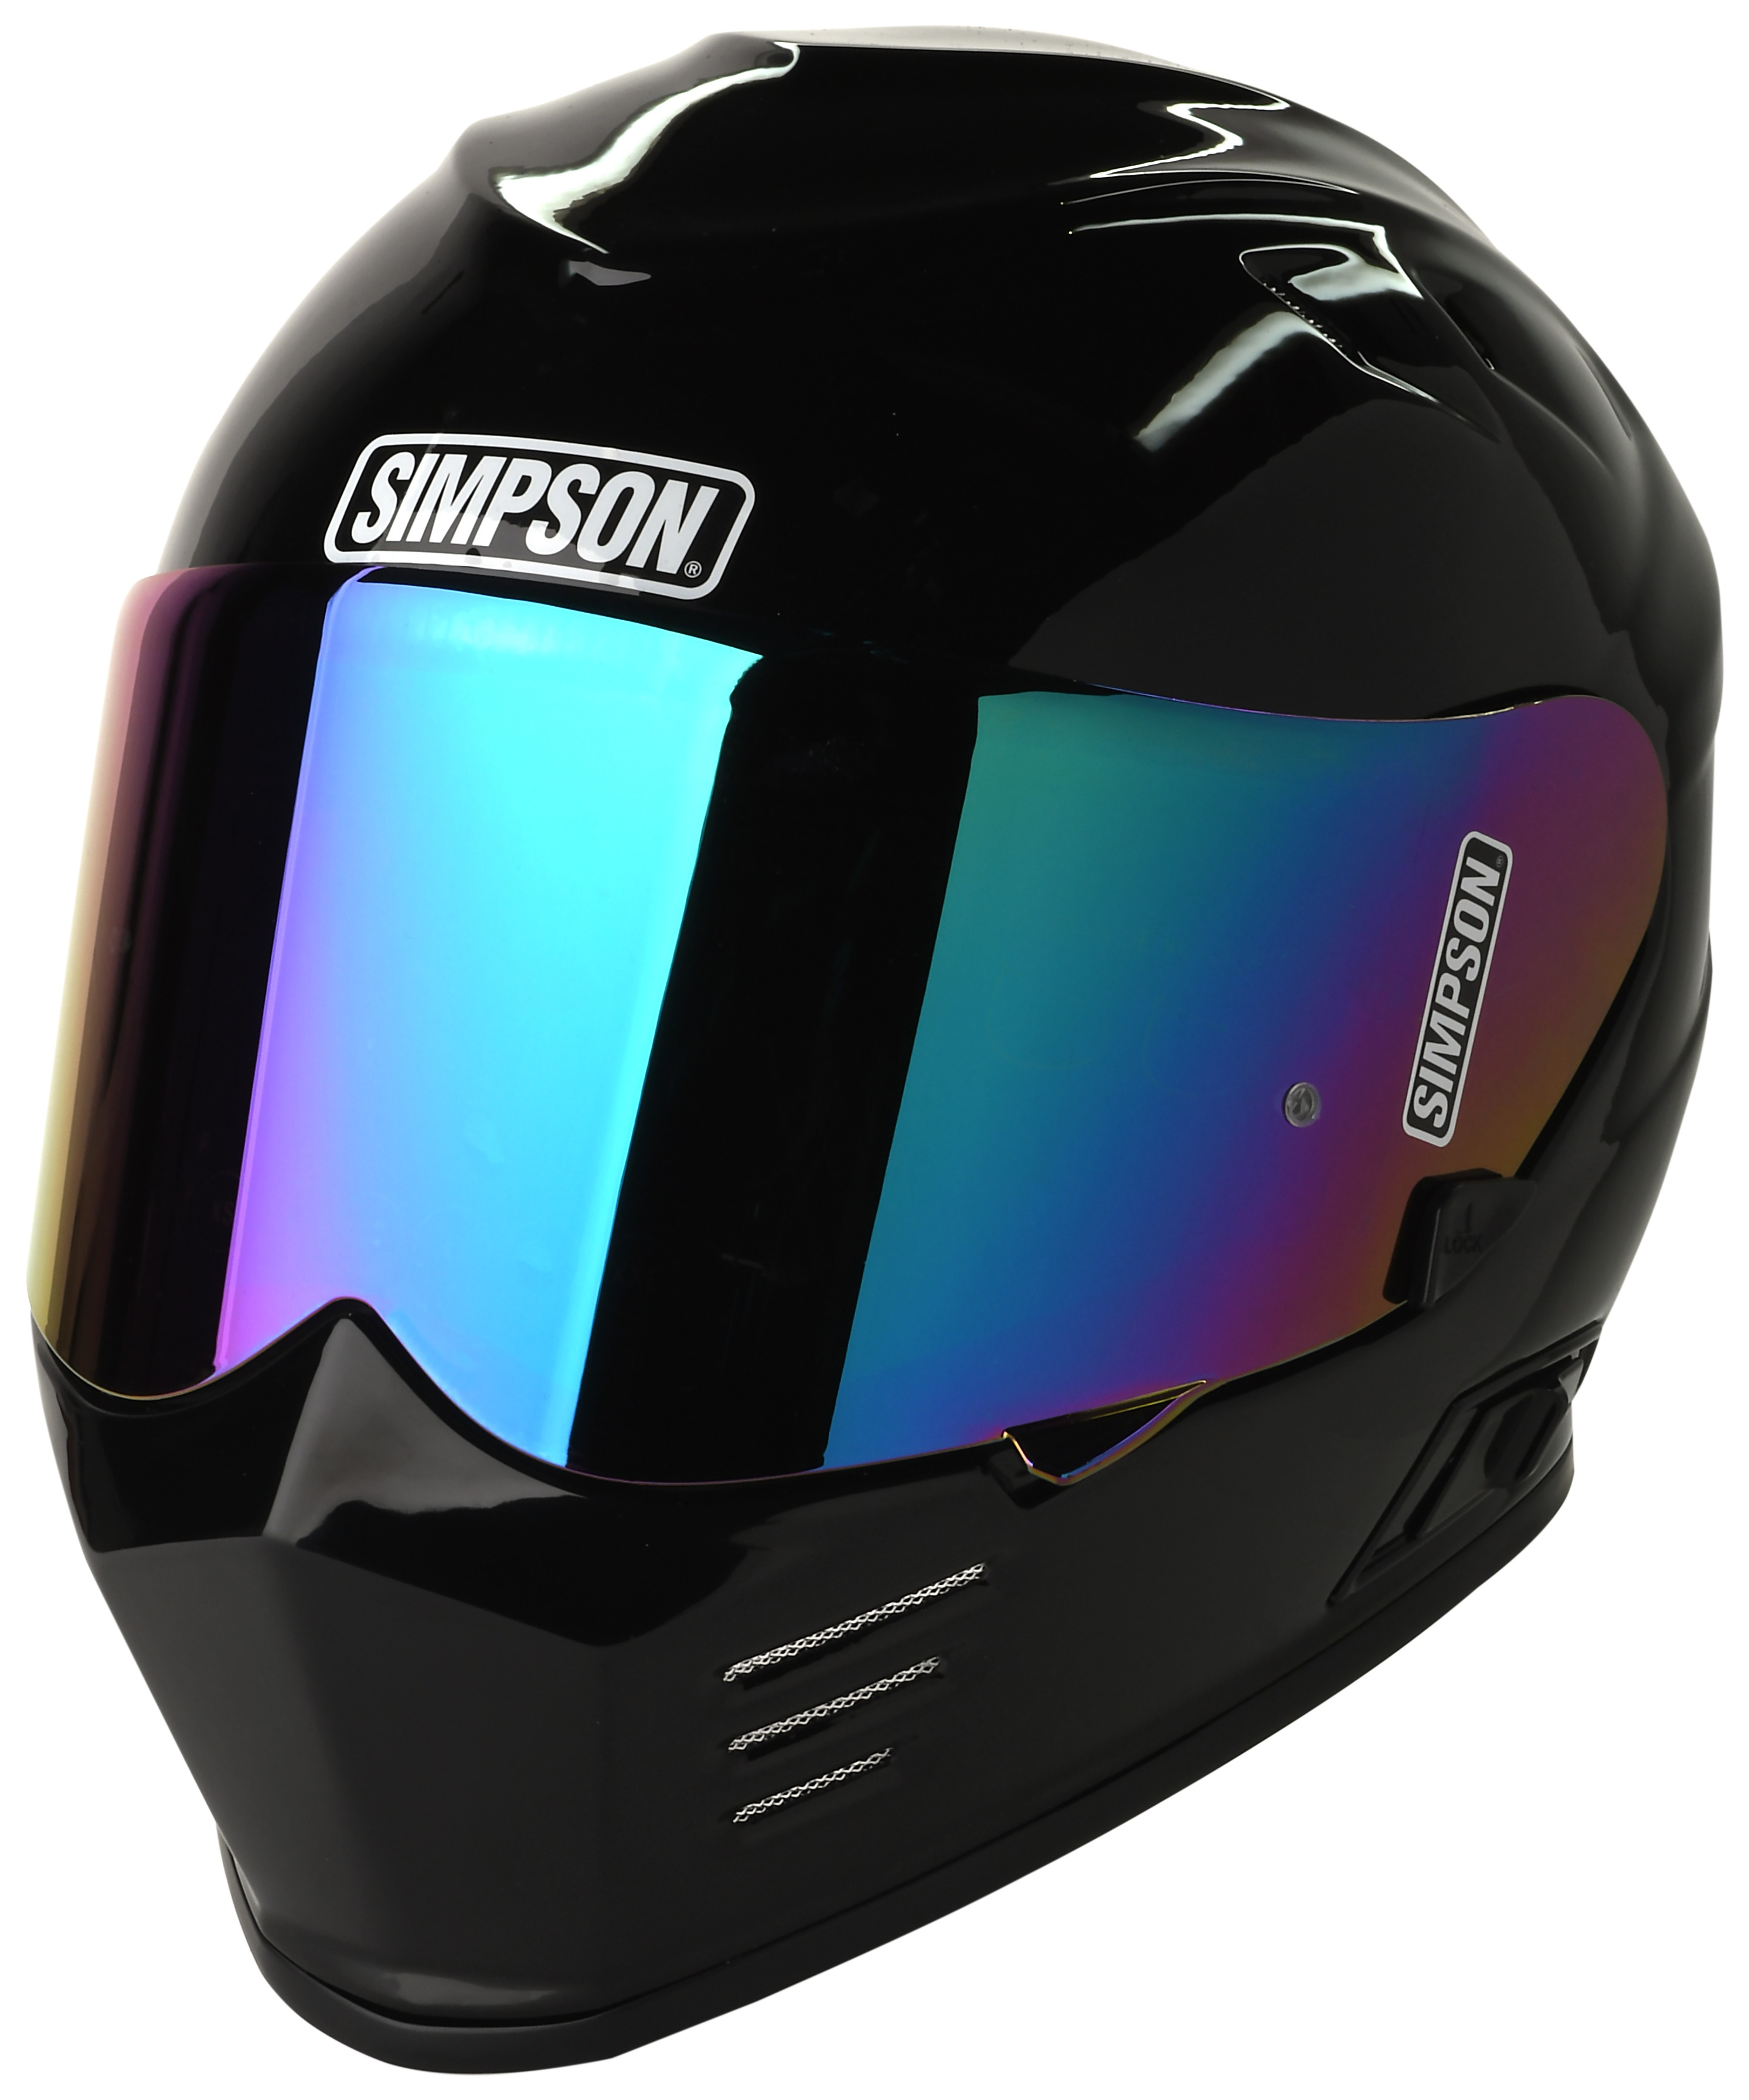 Dirt Bike Helmet With Visor >> Simpson Ghost Bandit Helmet - RevZilla